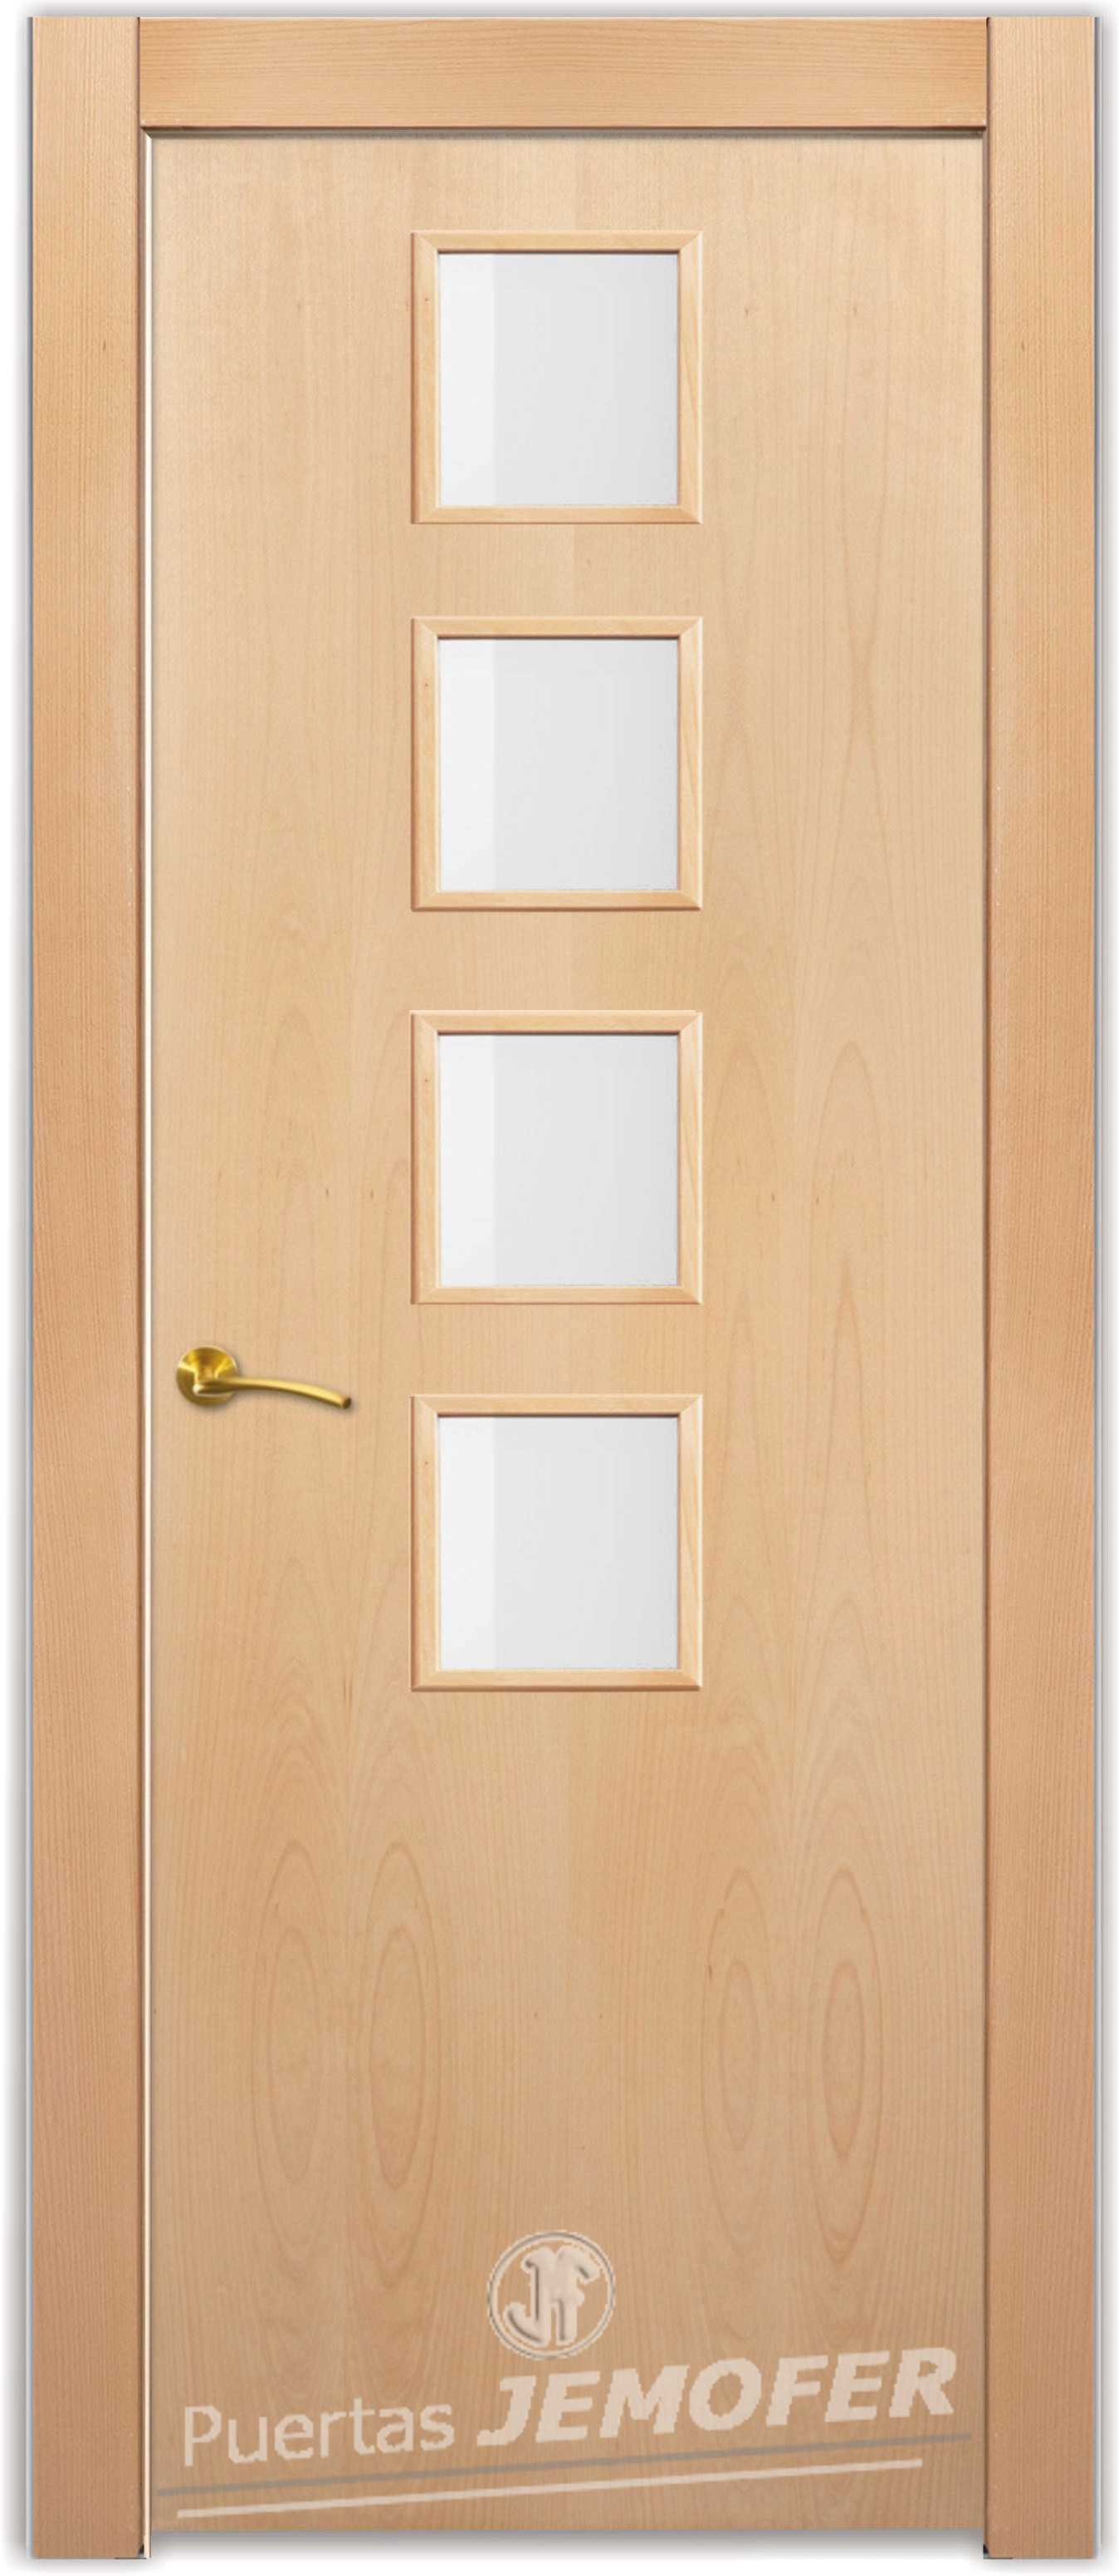 Puerta interior moderna l1 4vc puertas jemofer - Puertas modernas de interior ...